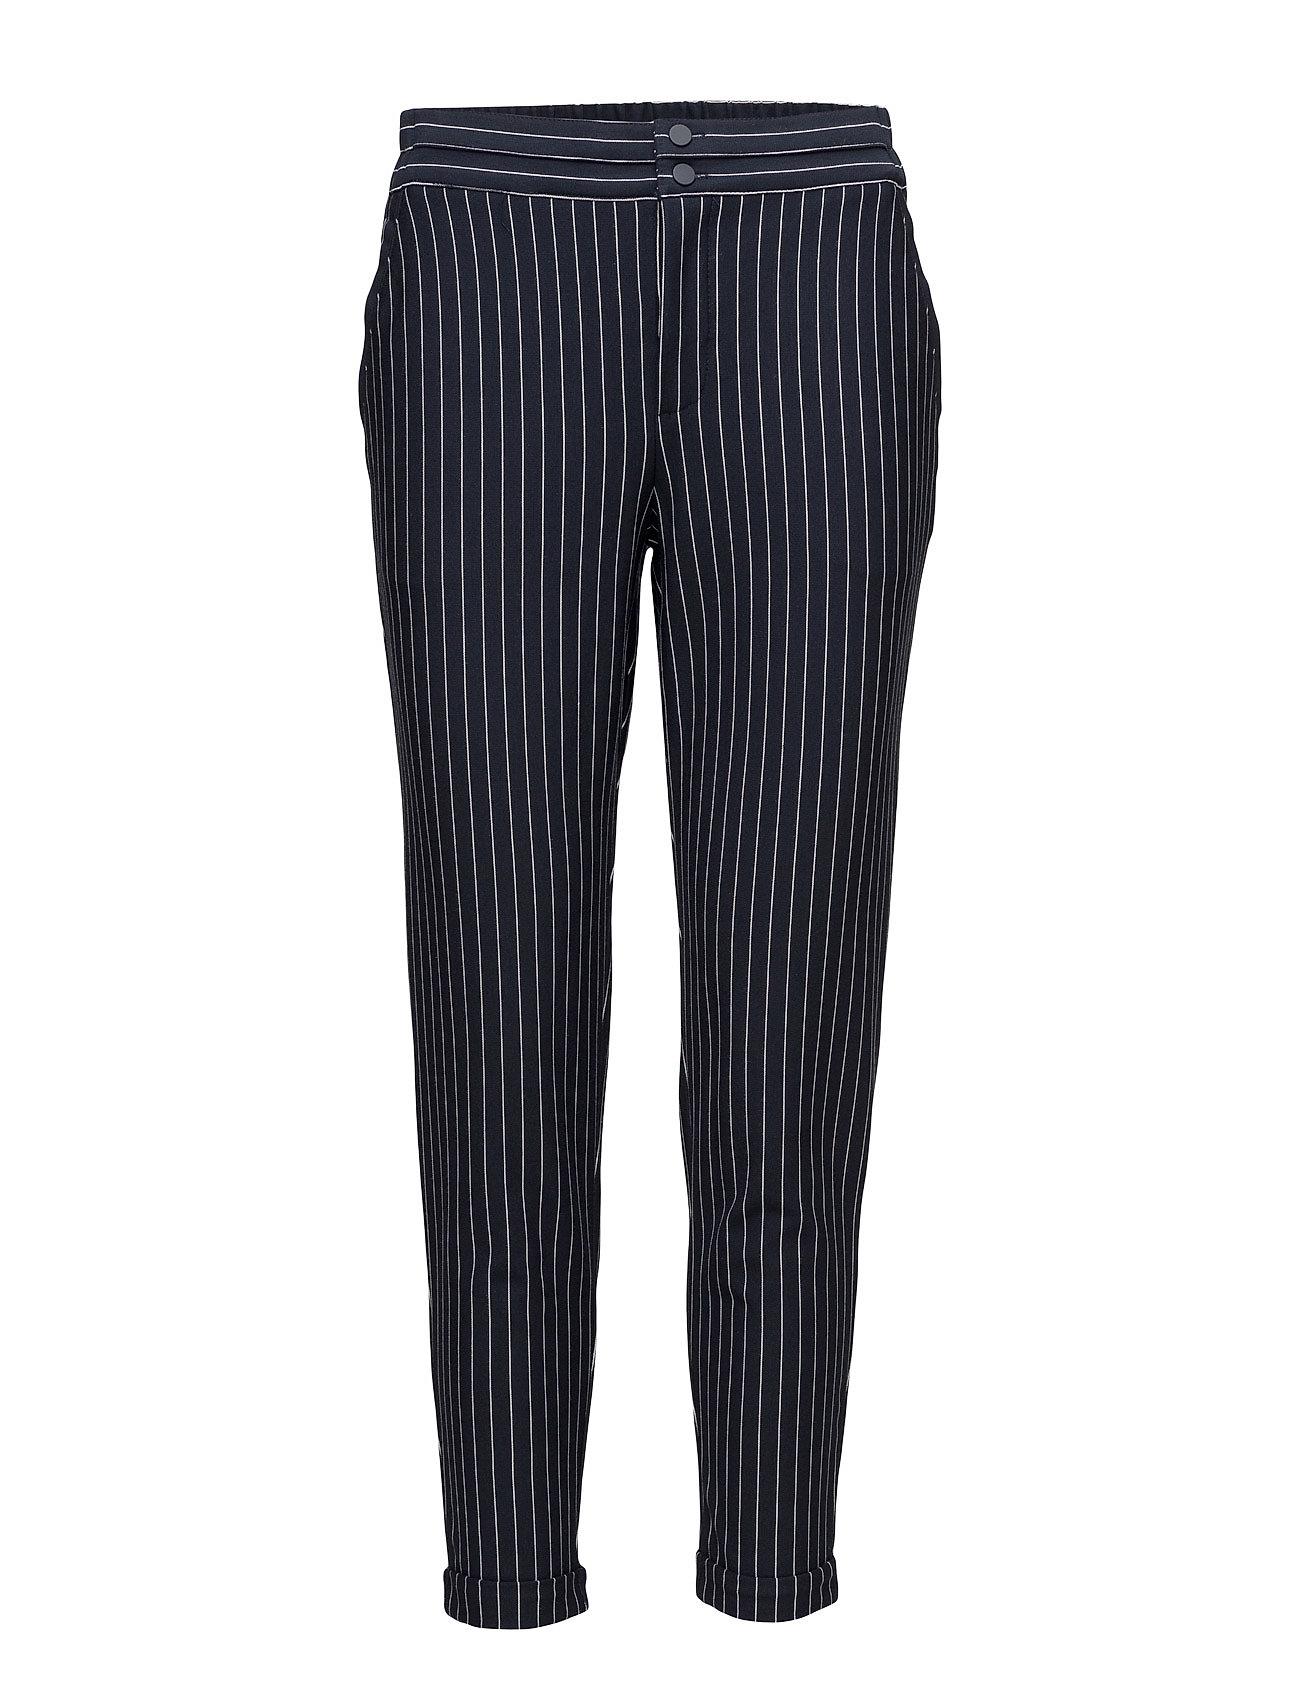 Nanni-Pa-Stripe FREE|QUENT Bukser til Damer i